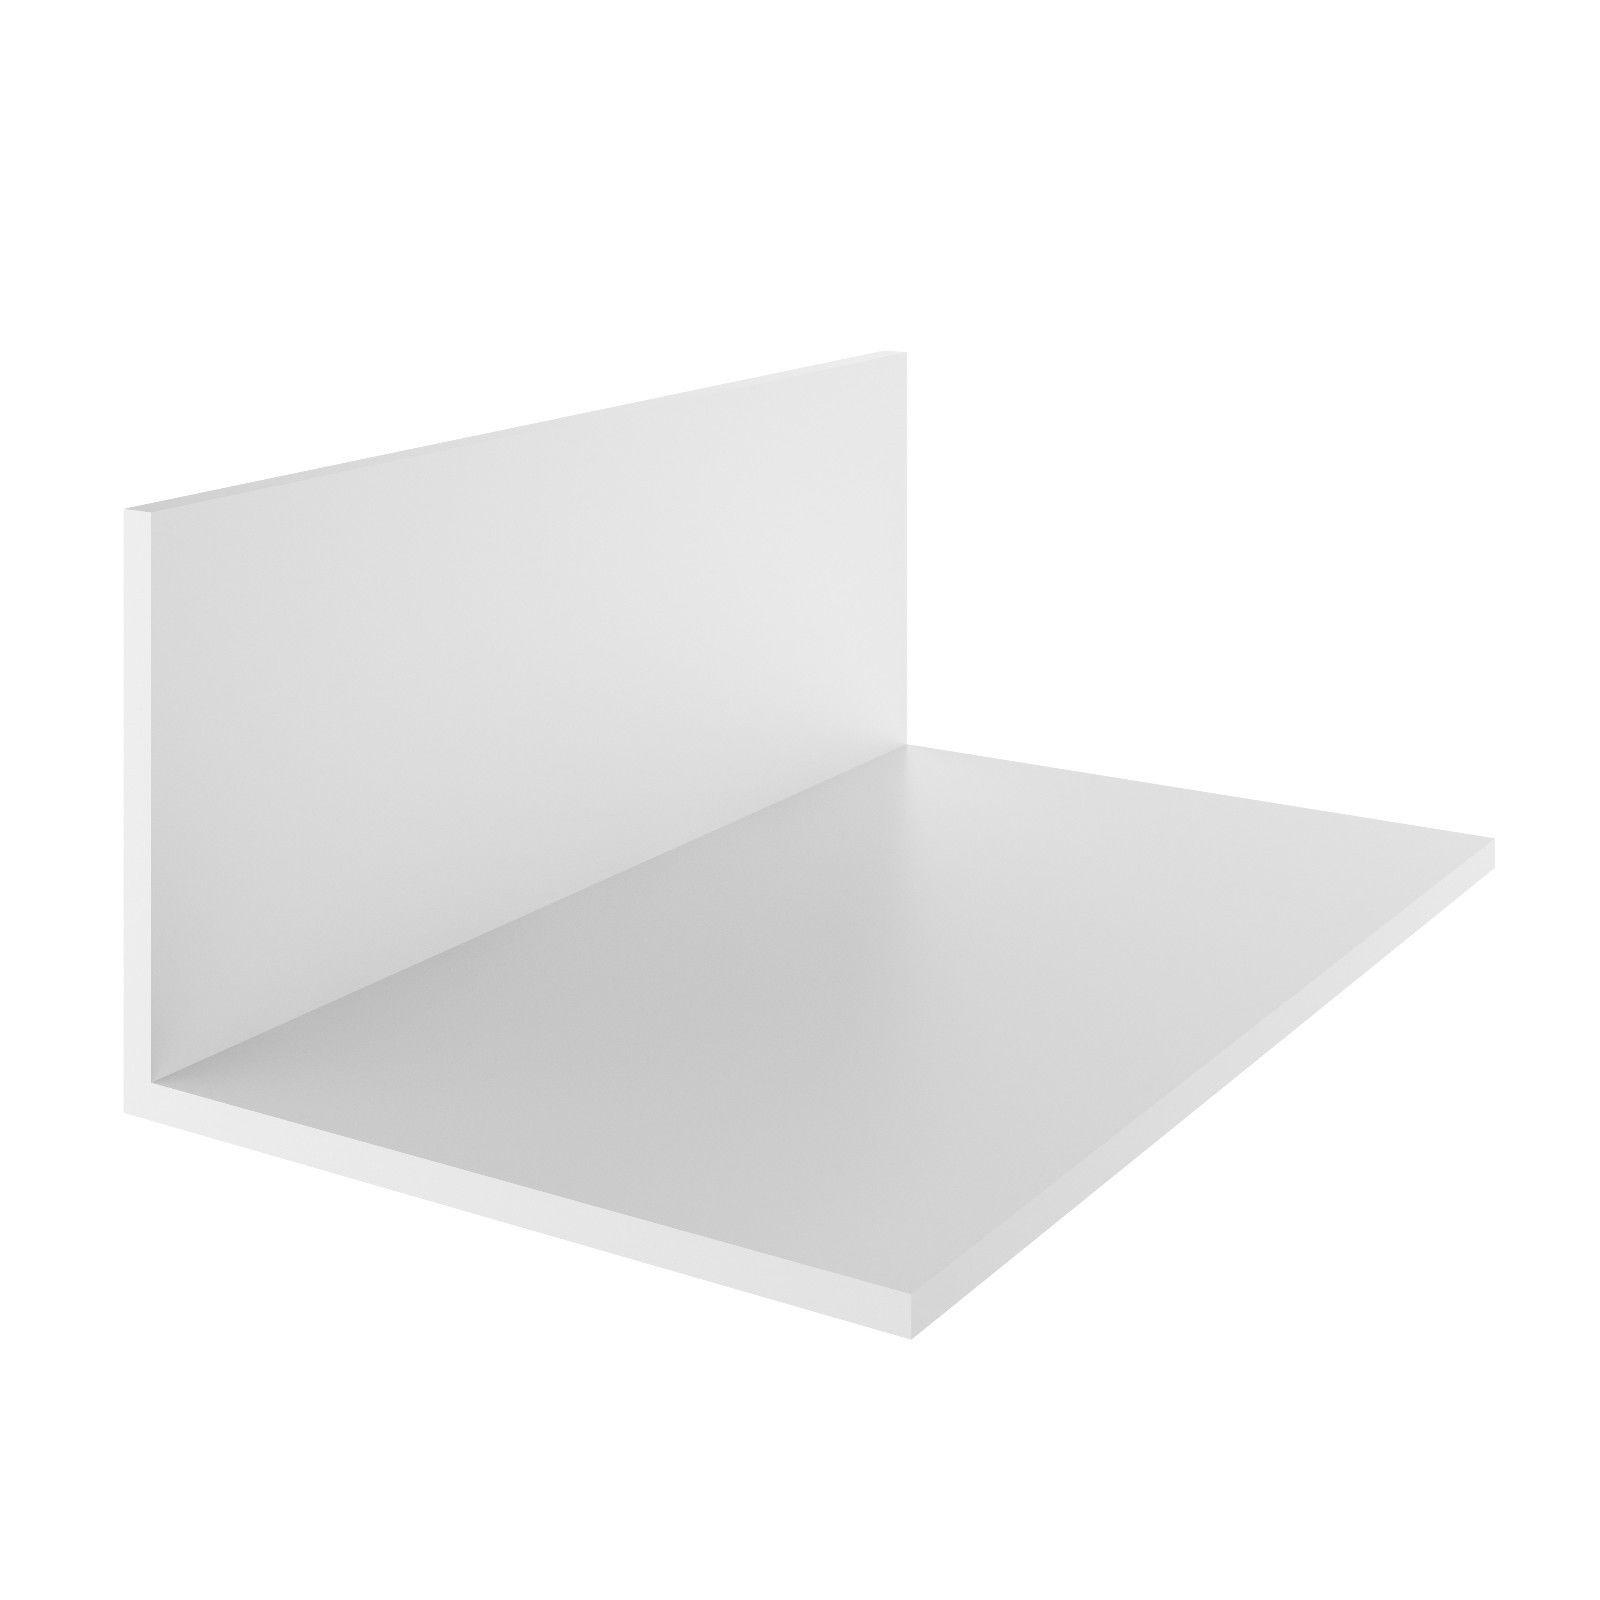 """2,73€/m"" 1,5m Profil Eckleiste Aussenwinkel PVC-Winkel Winkelprofil    50x30 mm"